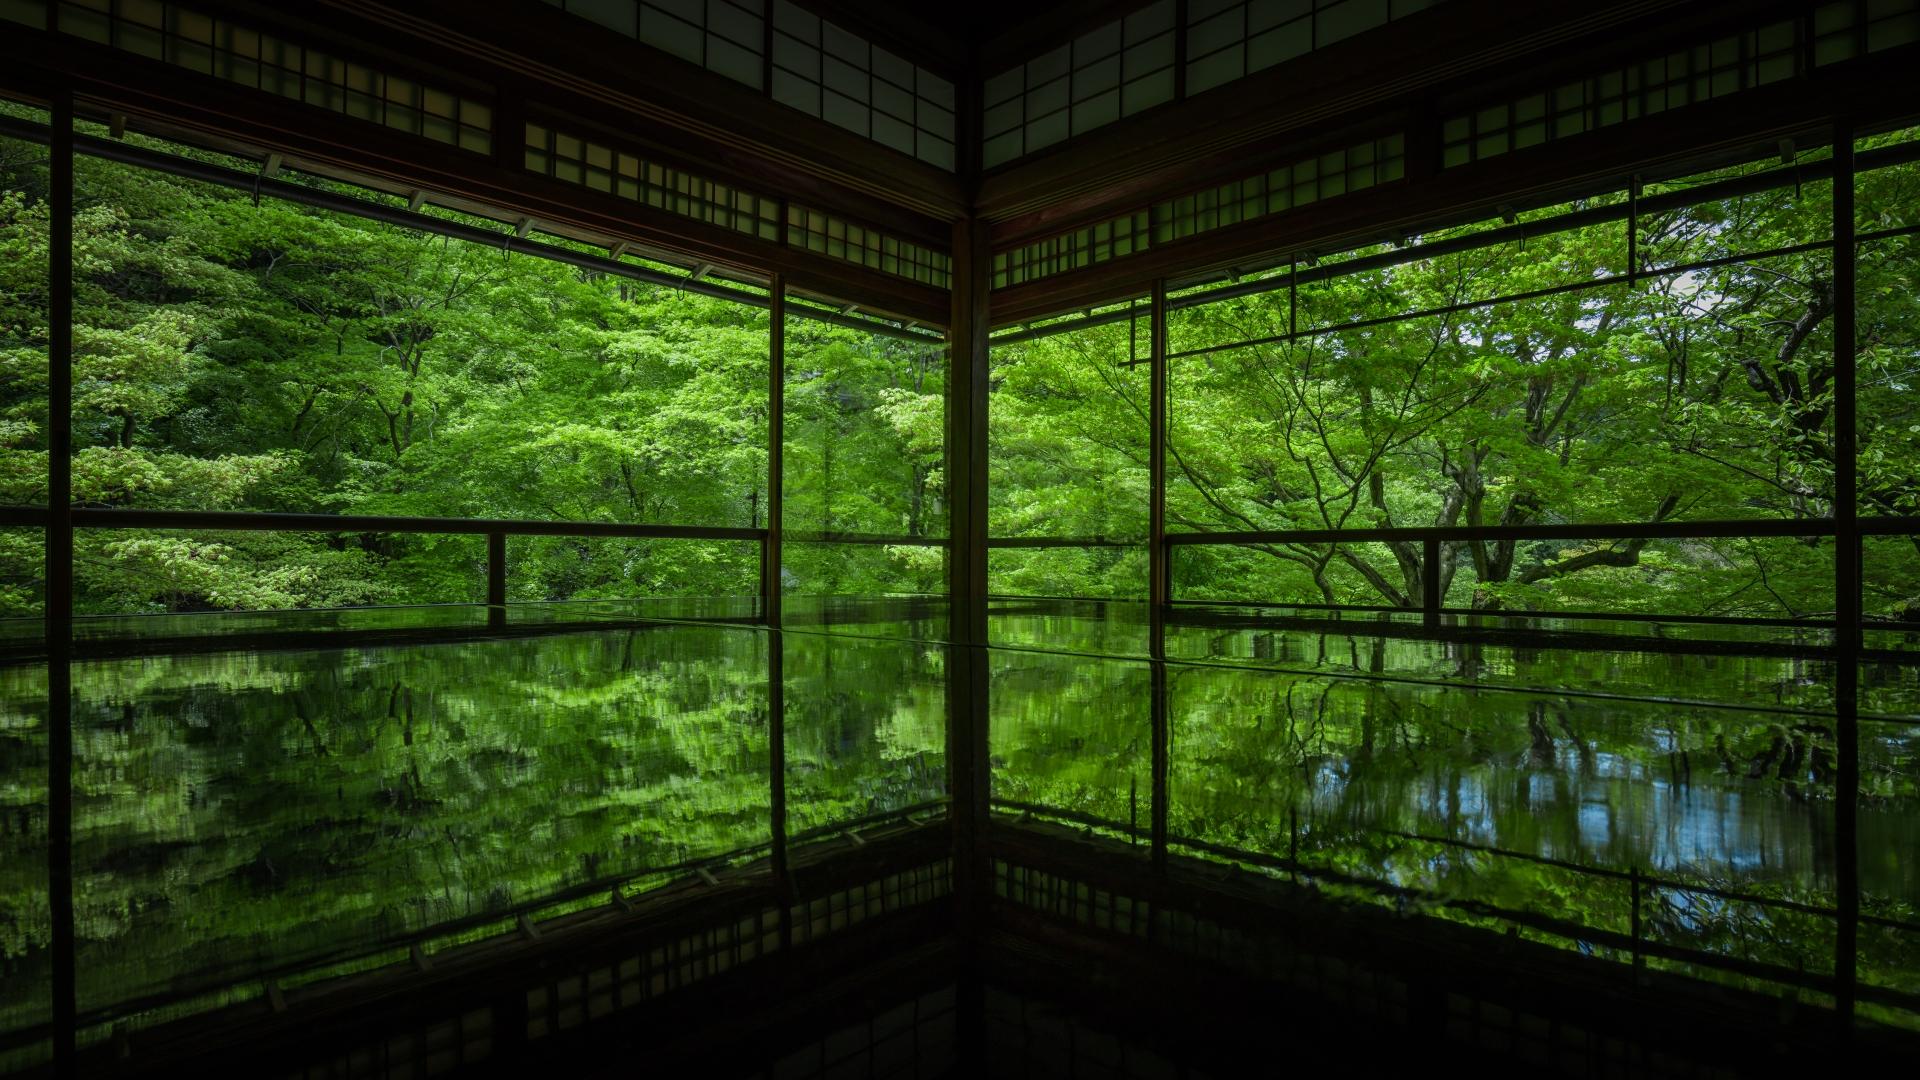 3926135_m 京都  瑠璃光院(京都の夏、新緑の時期におすすめのスポット!写真の紹介、アクセス情報など)